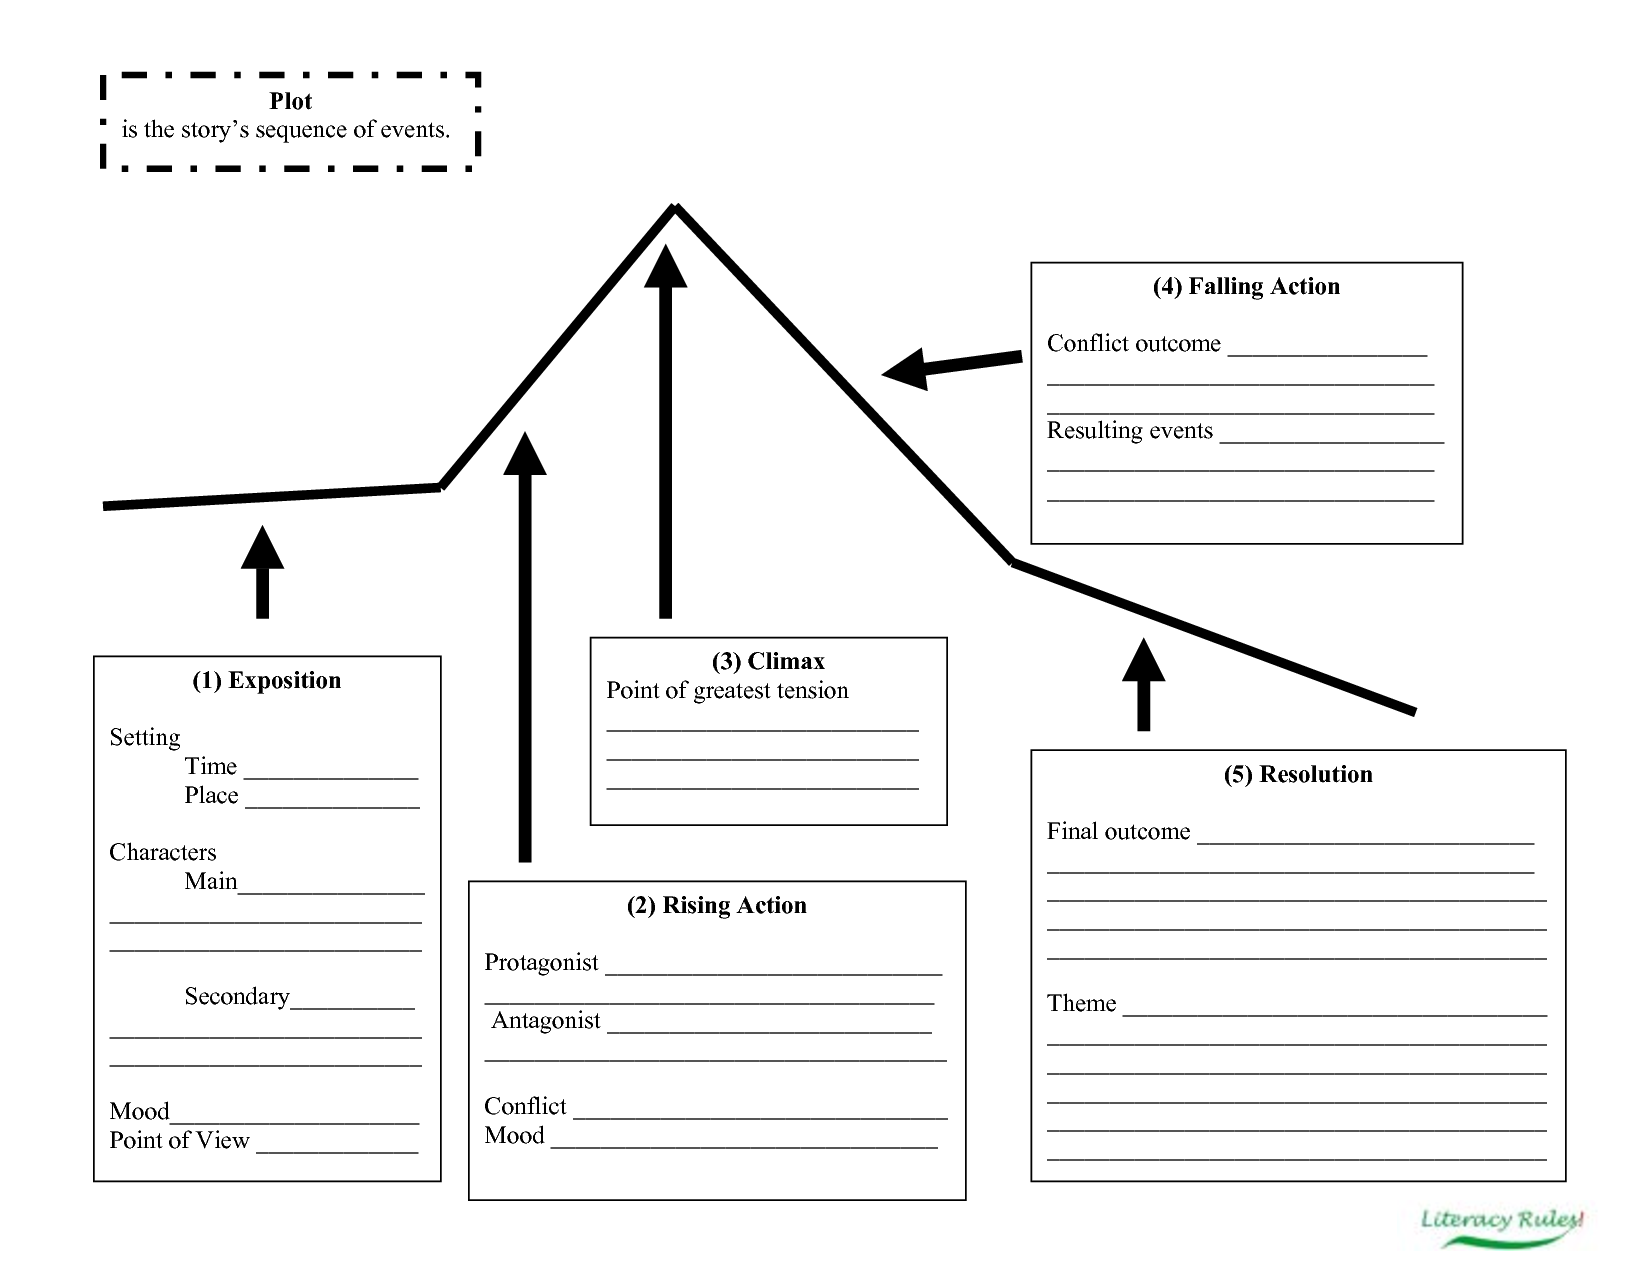 Plot Map - how to mind map a novel plot